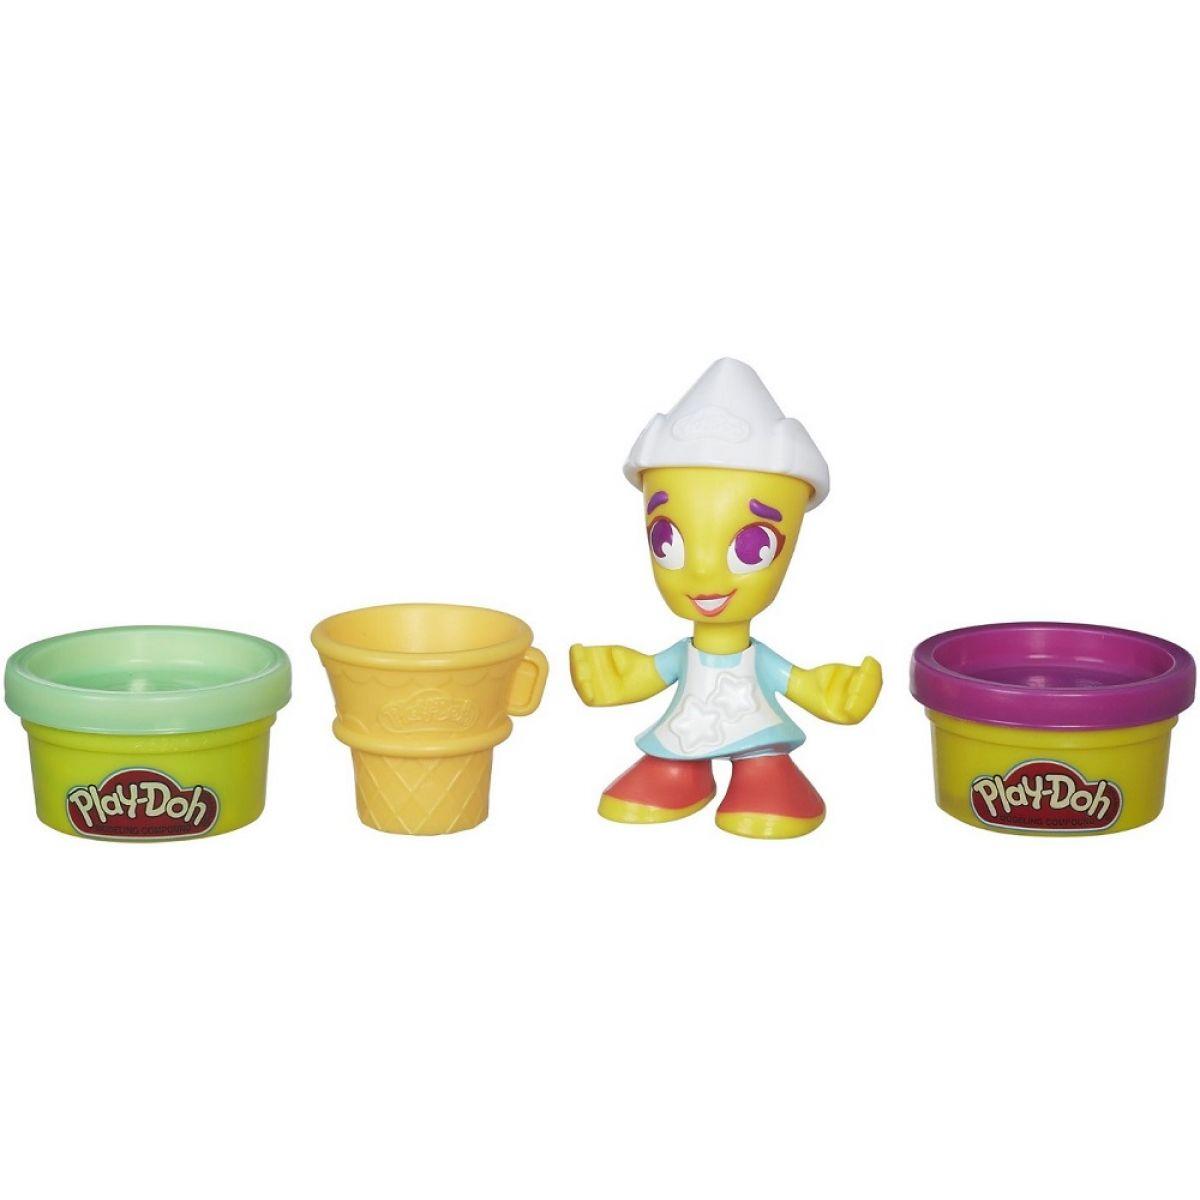 Play-Doh PLAY DOH TOWN figúrkami ASST